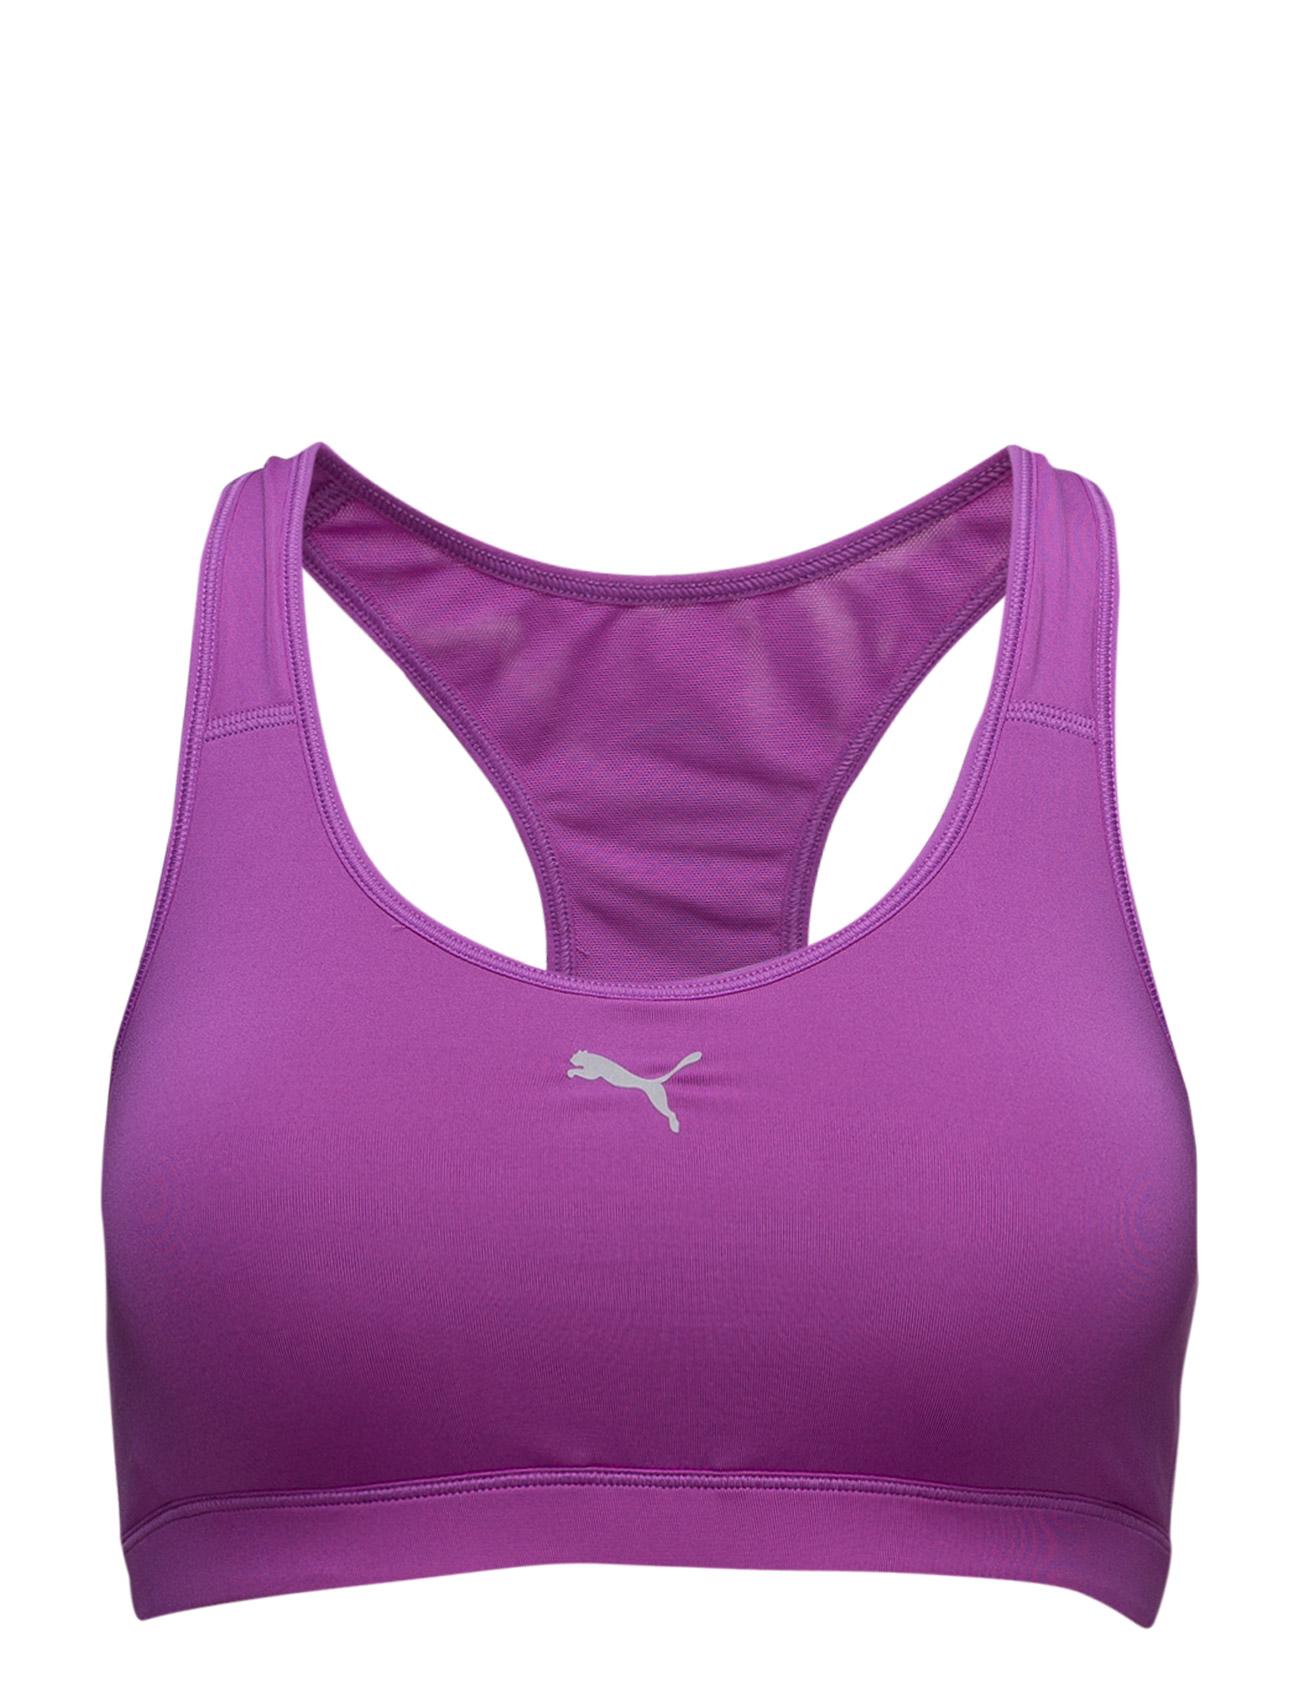 Pwrshape Cardio PUMA SPORT Sports undertøj til Damer i